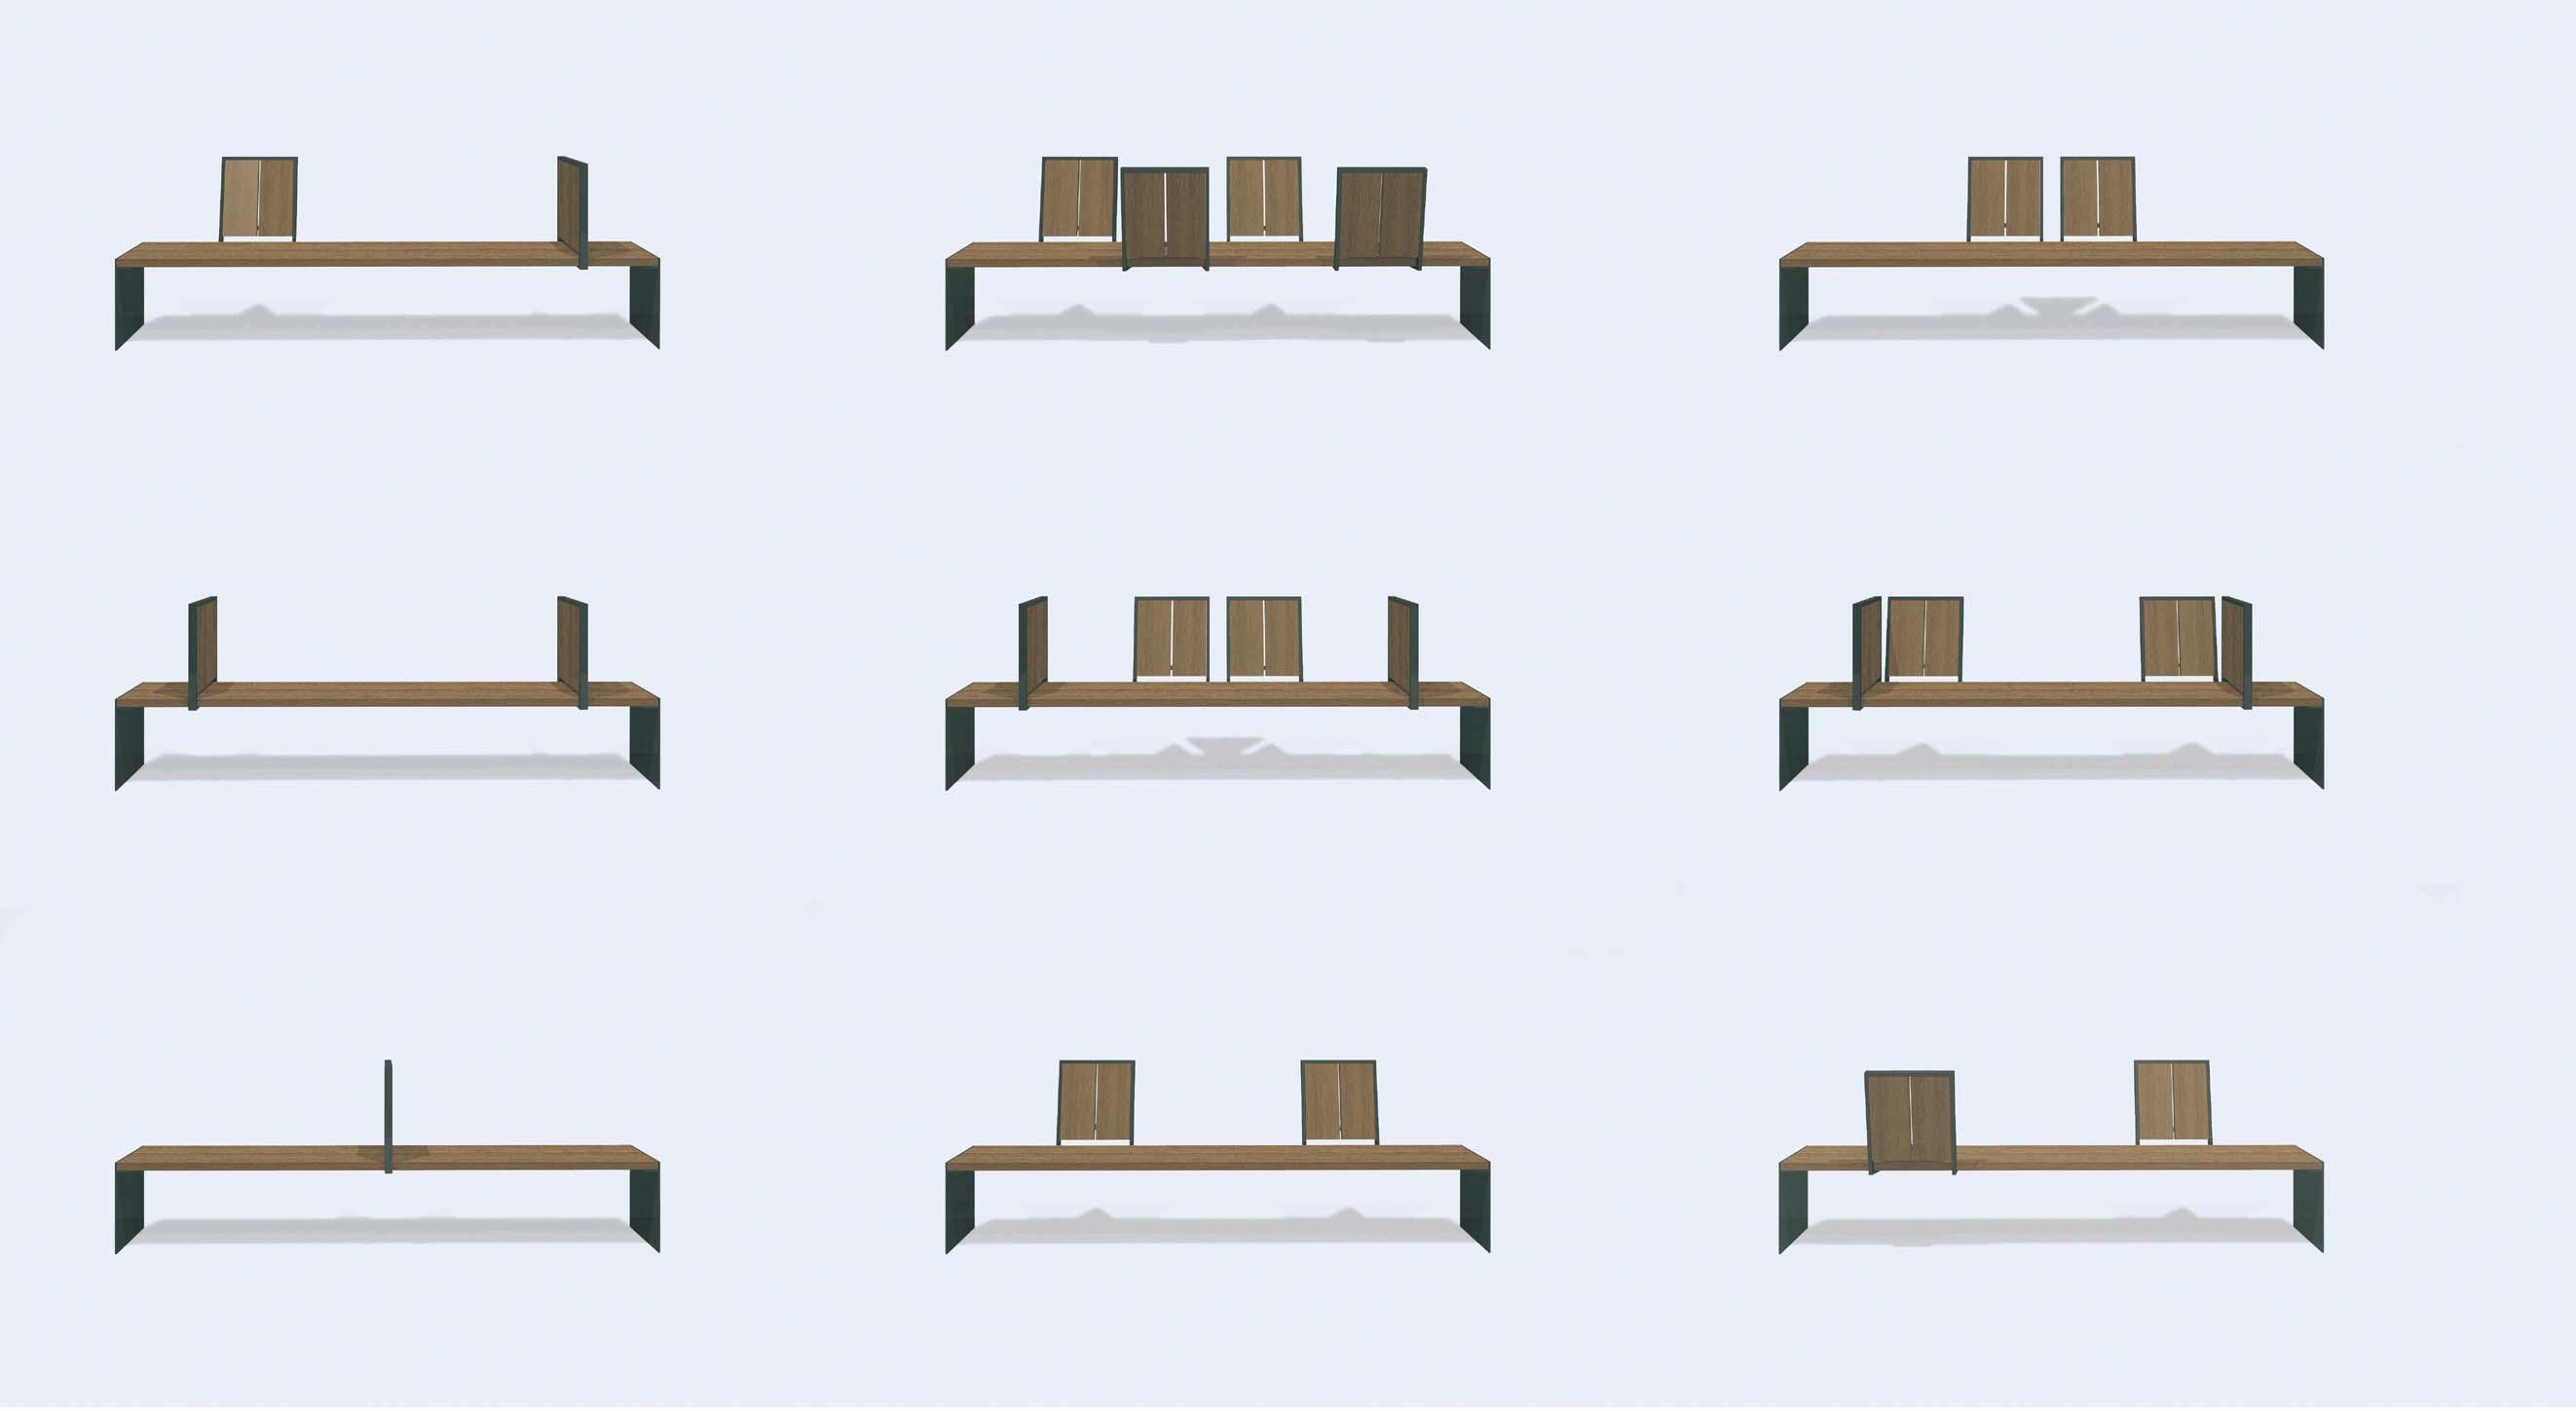 mobilier urbain_lucile Soufflet_1